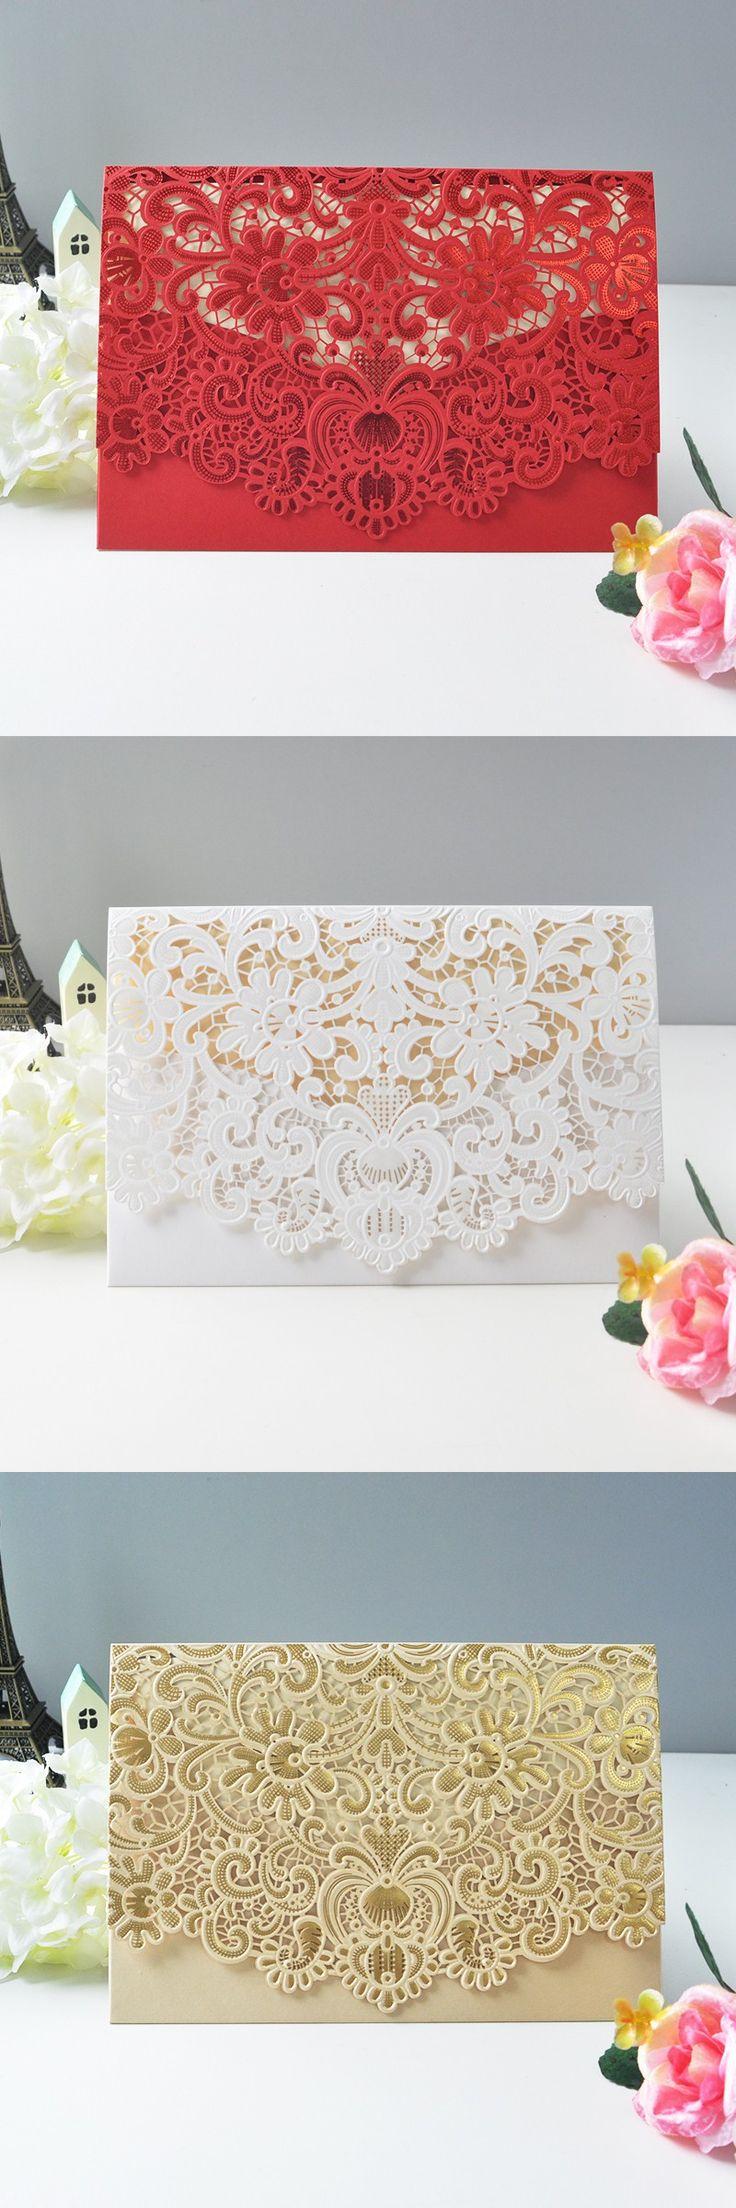 deer hunter wedding invitations%0A  sample Elegant flower design laser cut Wedding Invitation card white red  gold wedding invitations Free Printing